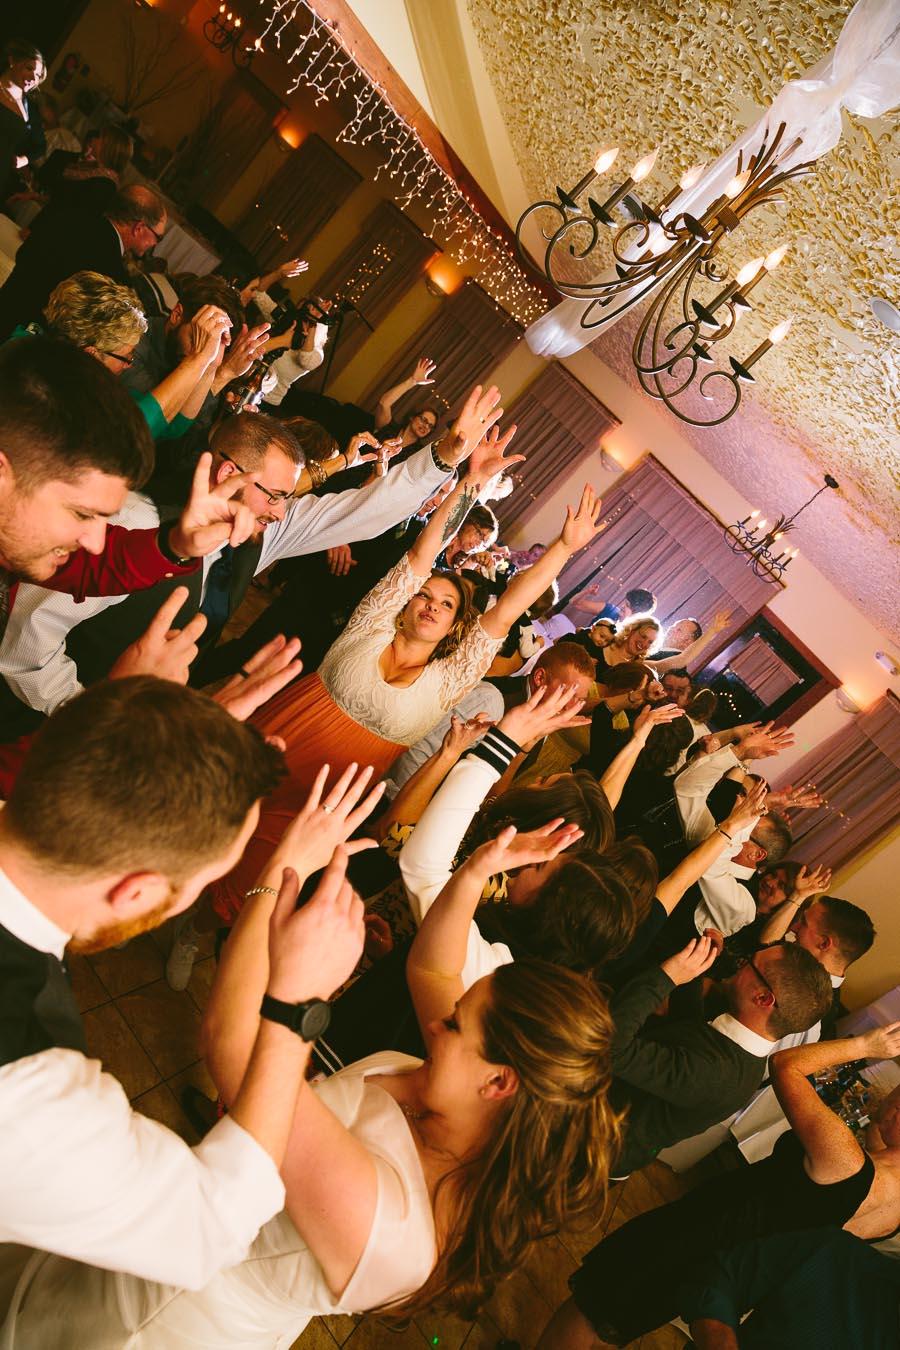 landolls-mohican-castle-wedding-photography-62.jpg